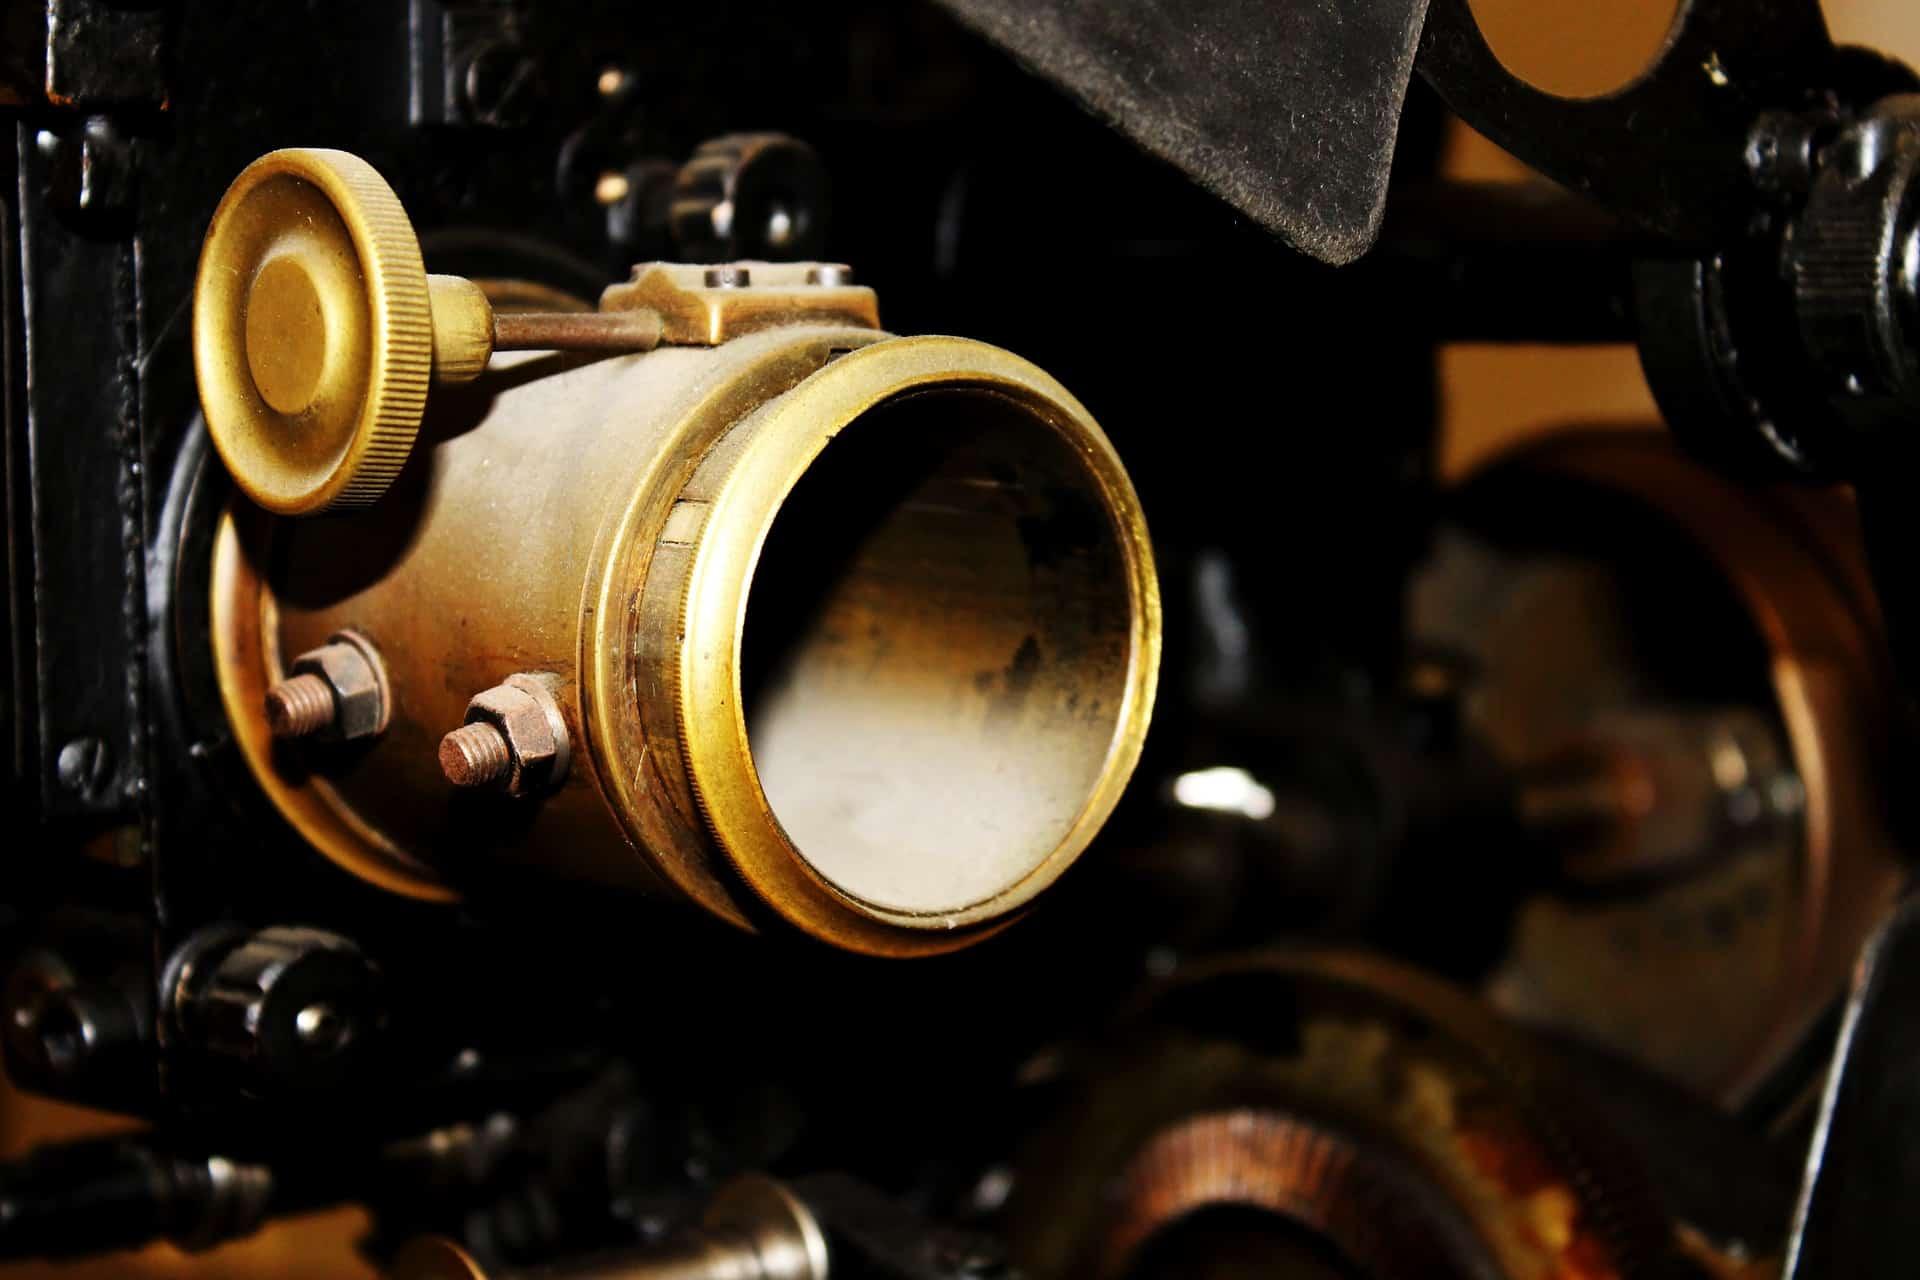 projector-1117916_1920